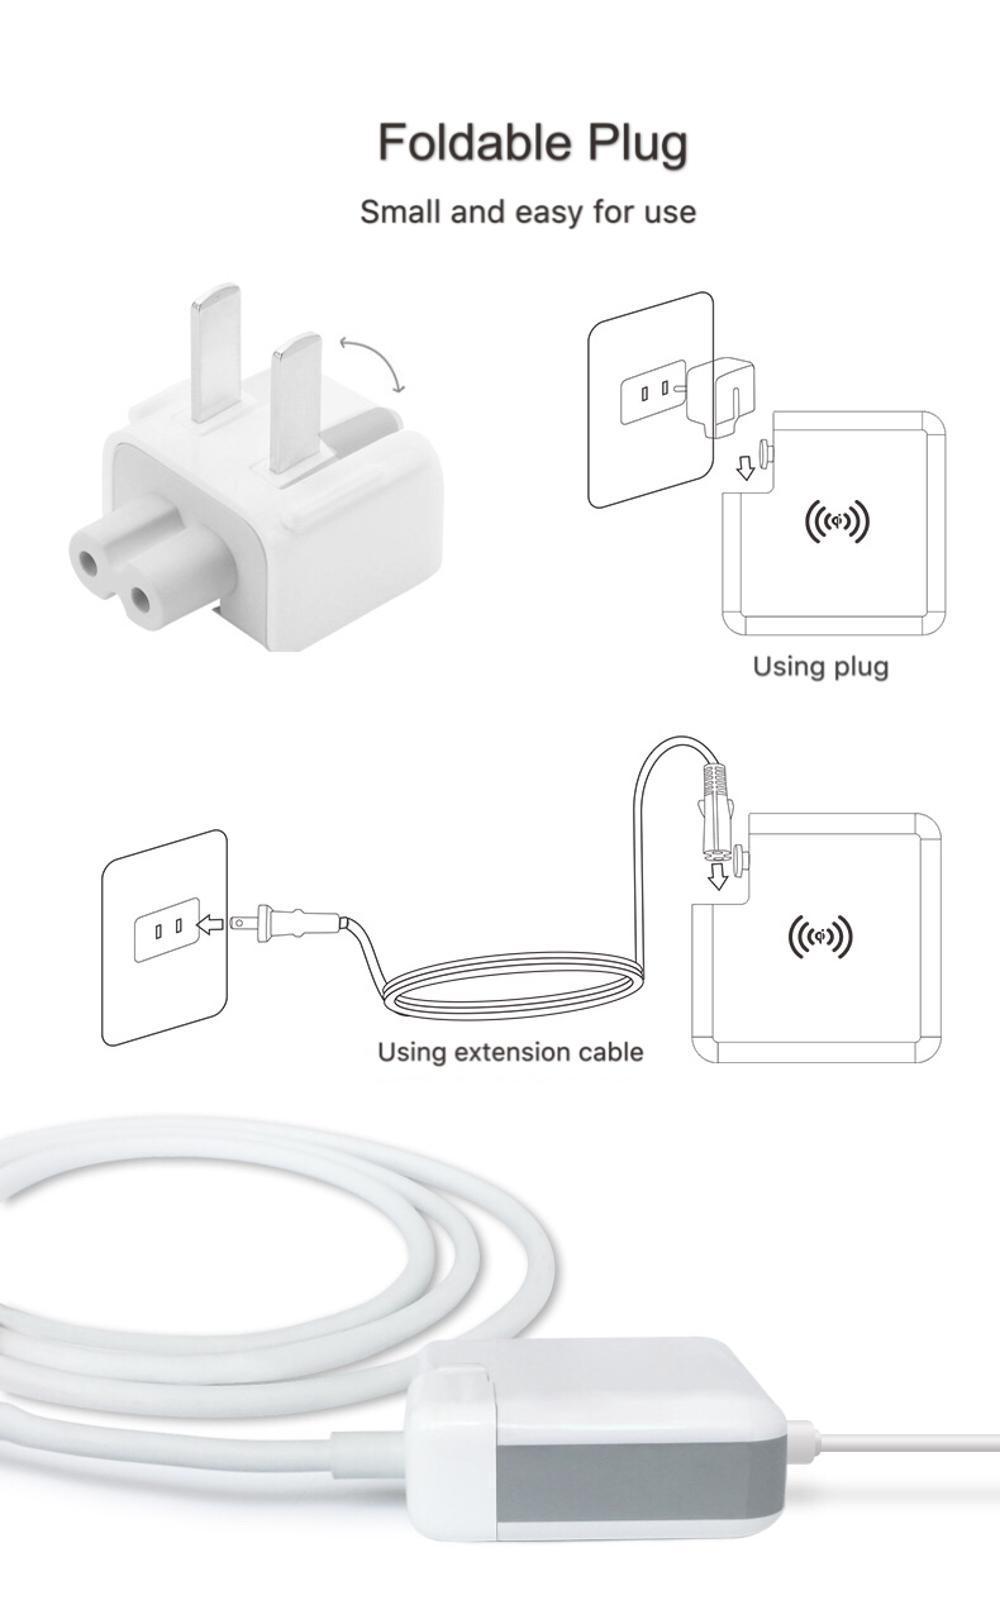 Wholesale universal travel charger Qi wireless mulifunctional power bank 6700mAh 16